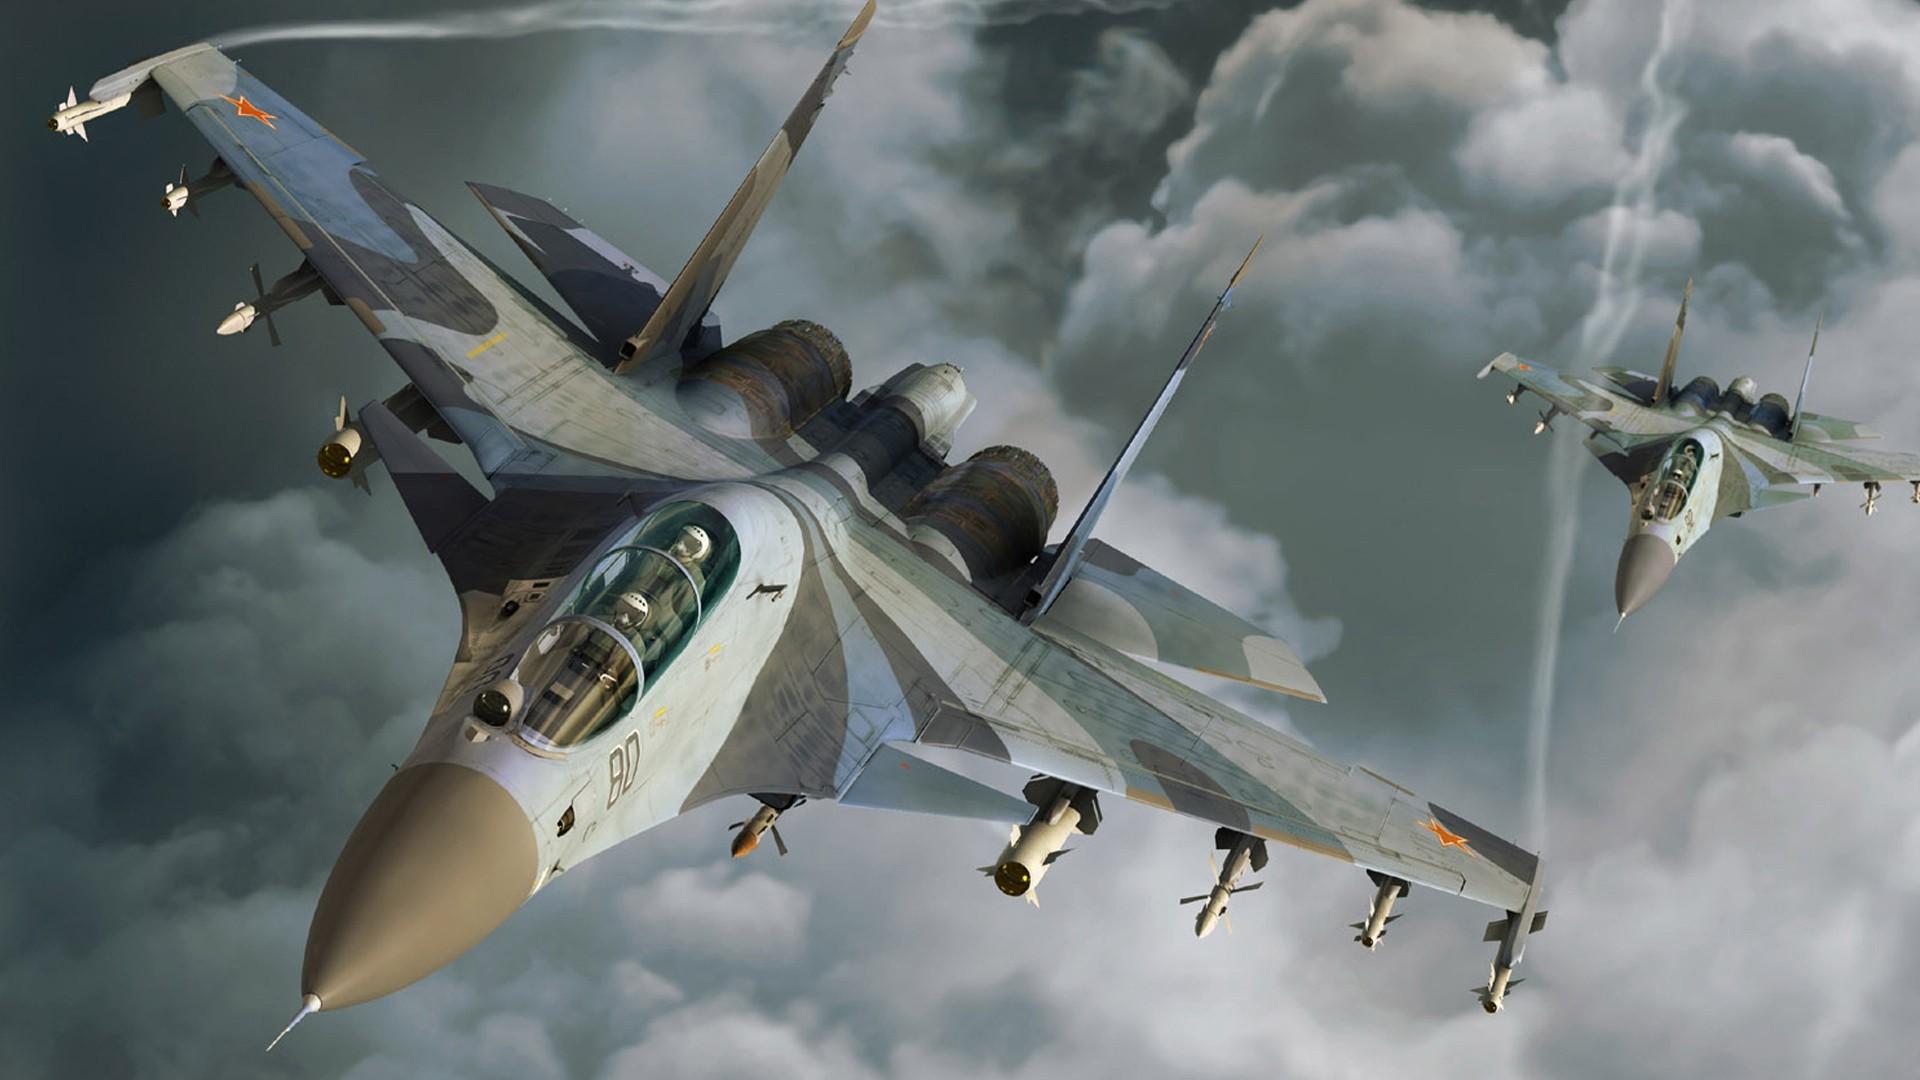 Amazing War Aircraft screensavers and wallpapers 1920x1080